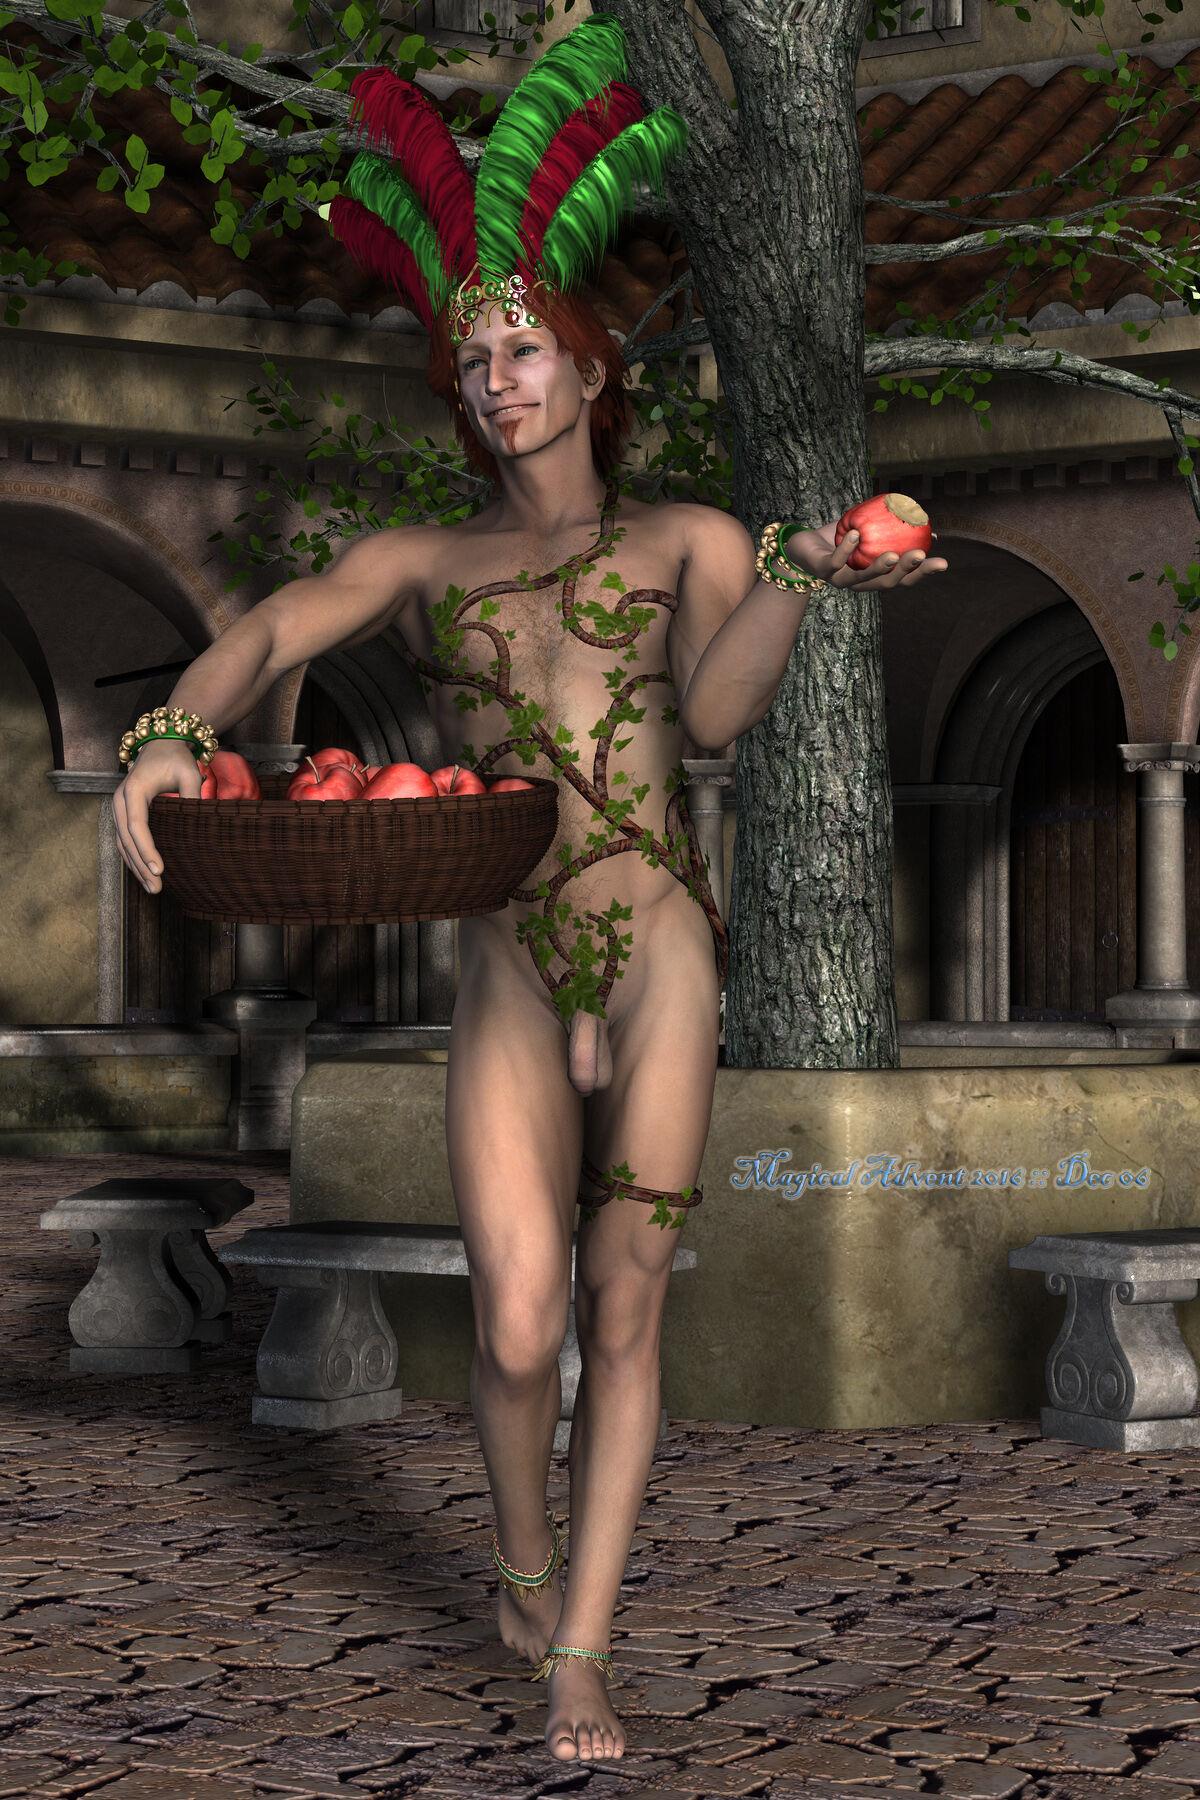 [IMG] 06-Kinnon-apples-01-fix.jpg